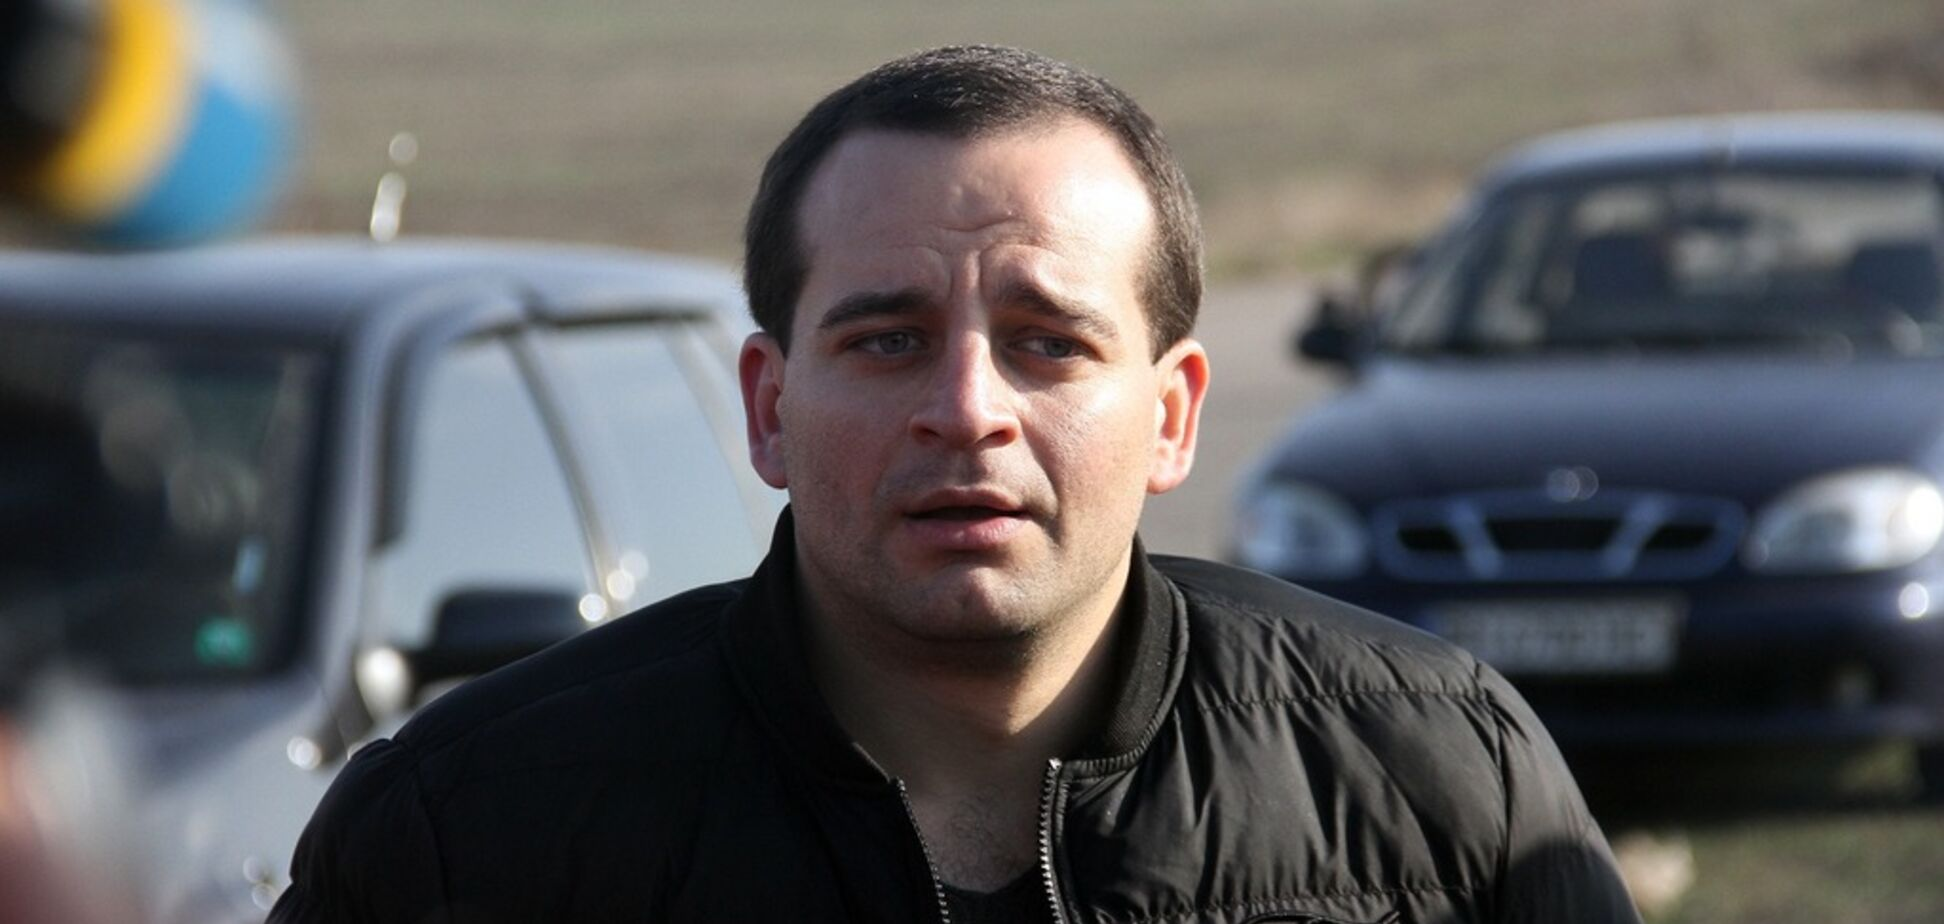 Одесский Ван Дамм: каскадер проехал на авто, стоя на руках. Фото и видео